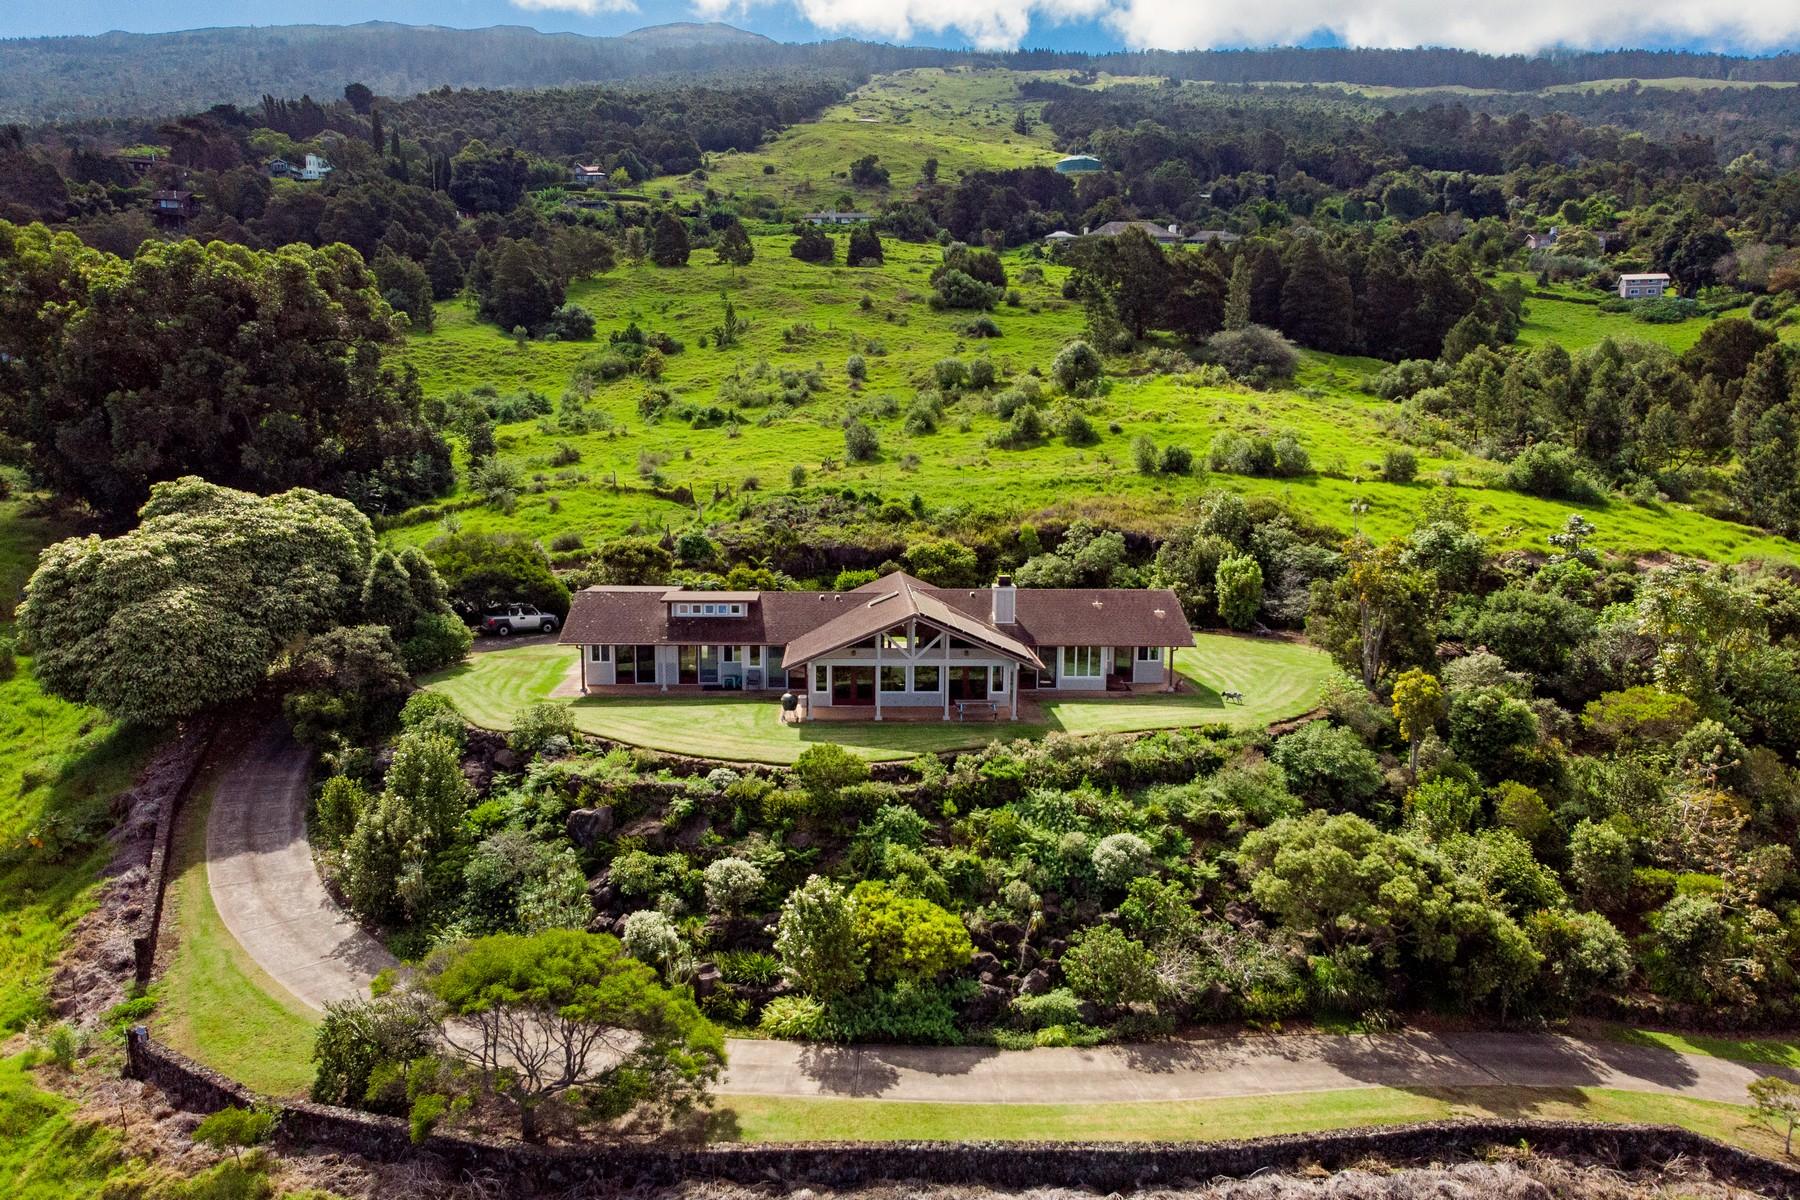 農場 / 牧場 / 種植場 為 出售 在 Stunning 7 Acre Kula Property Surrounded by Native Hawaiian Landscaping 165 Maukanani Rd, Kula, 夏威夷 96790 美國